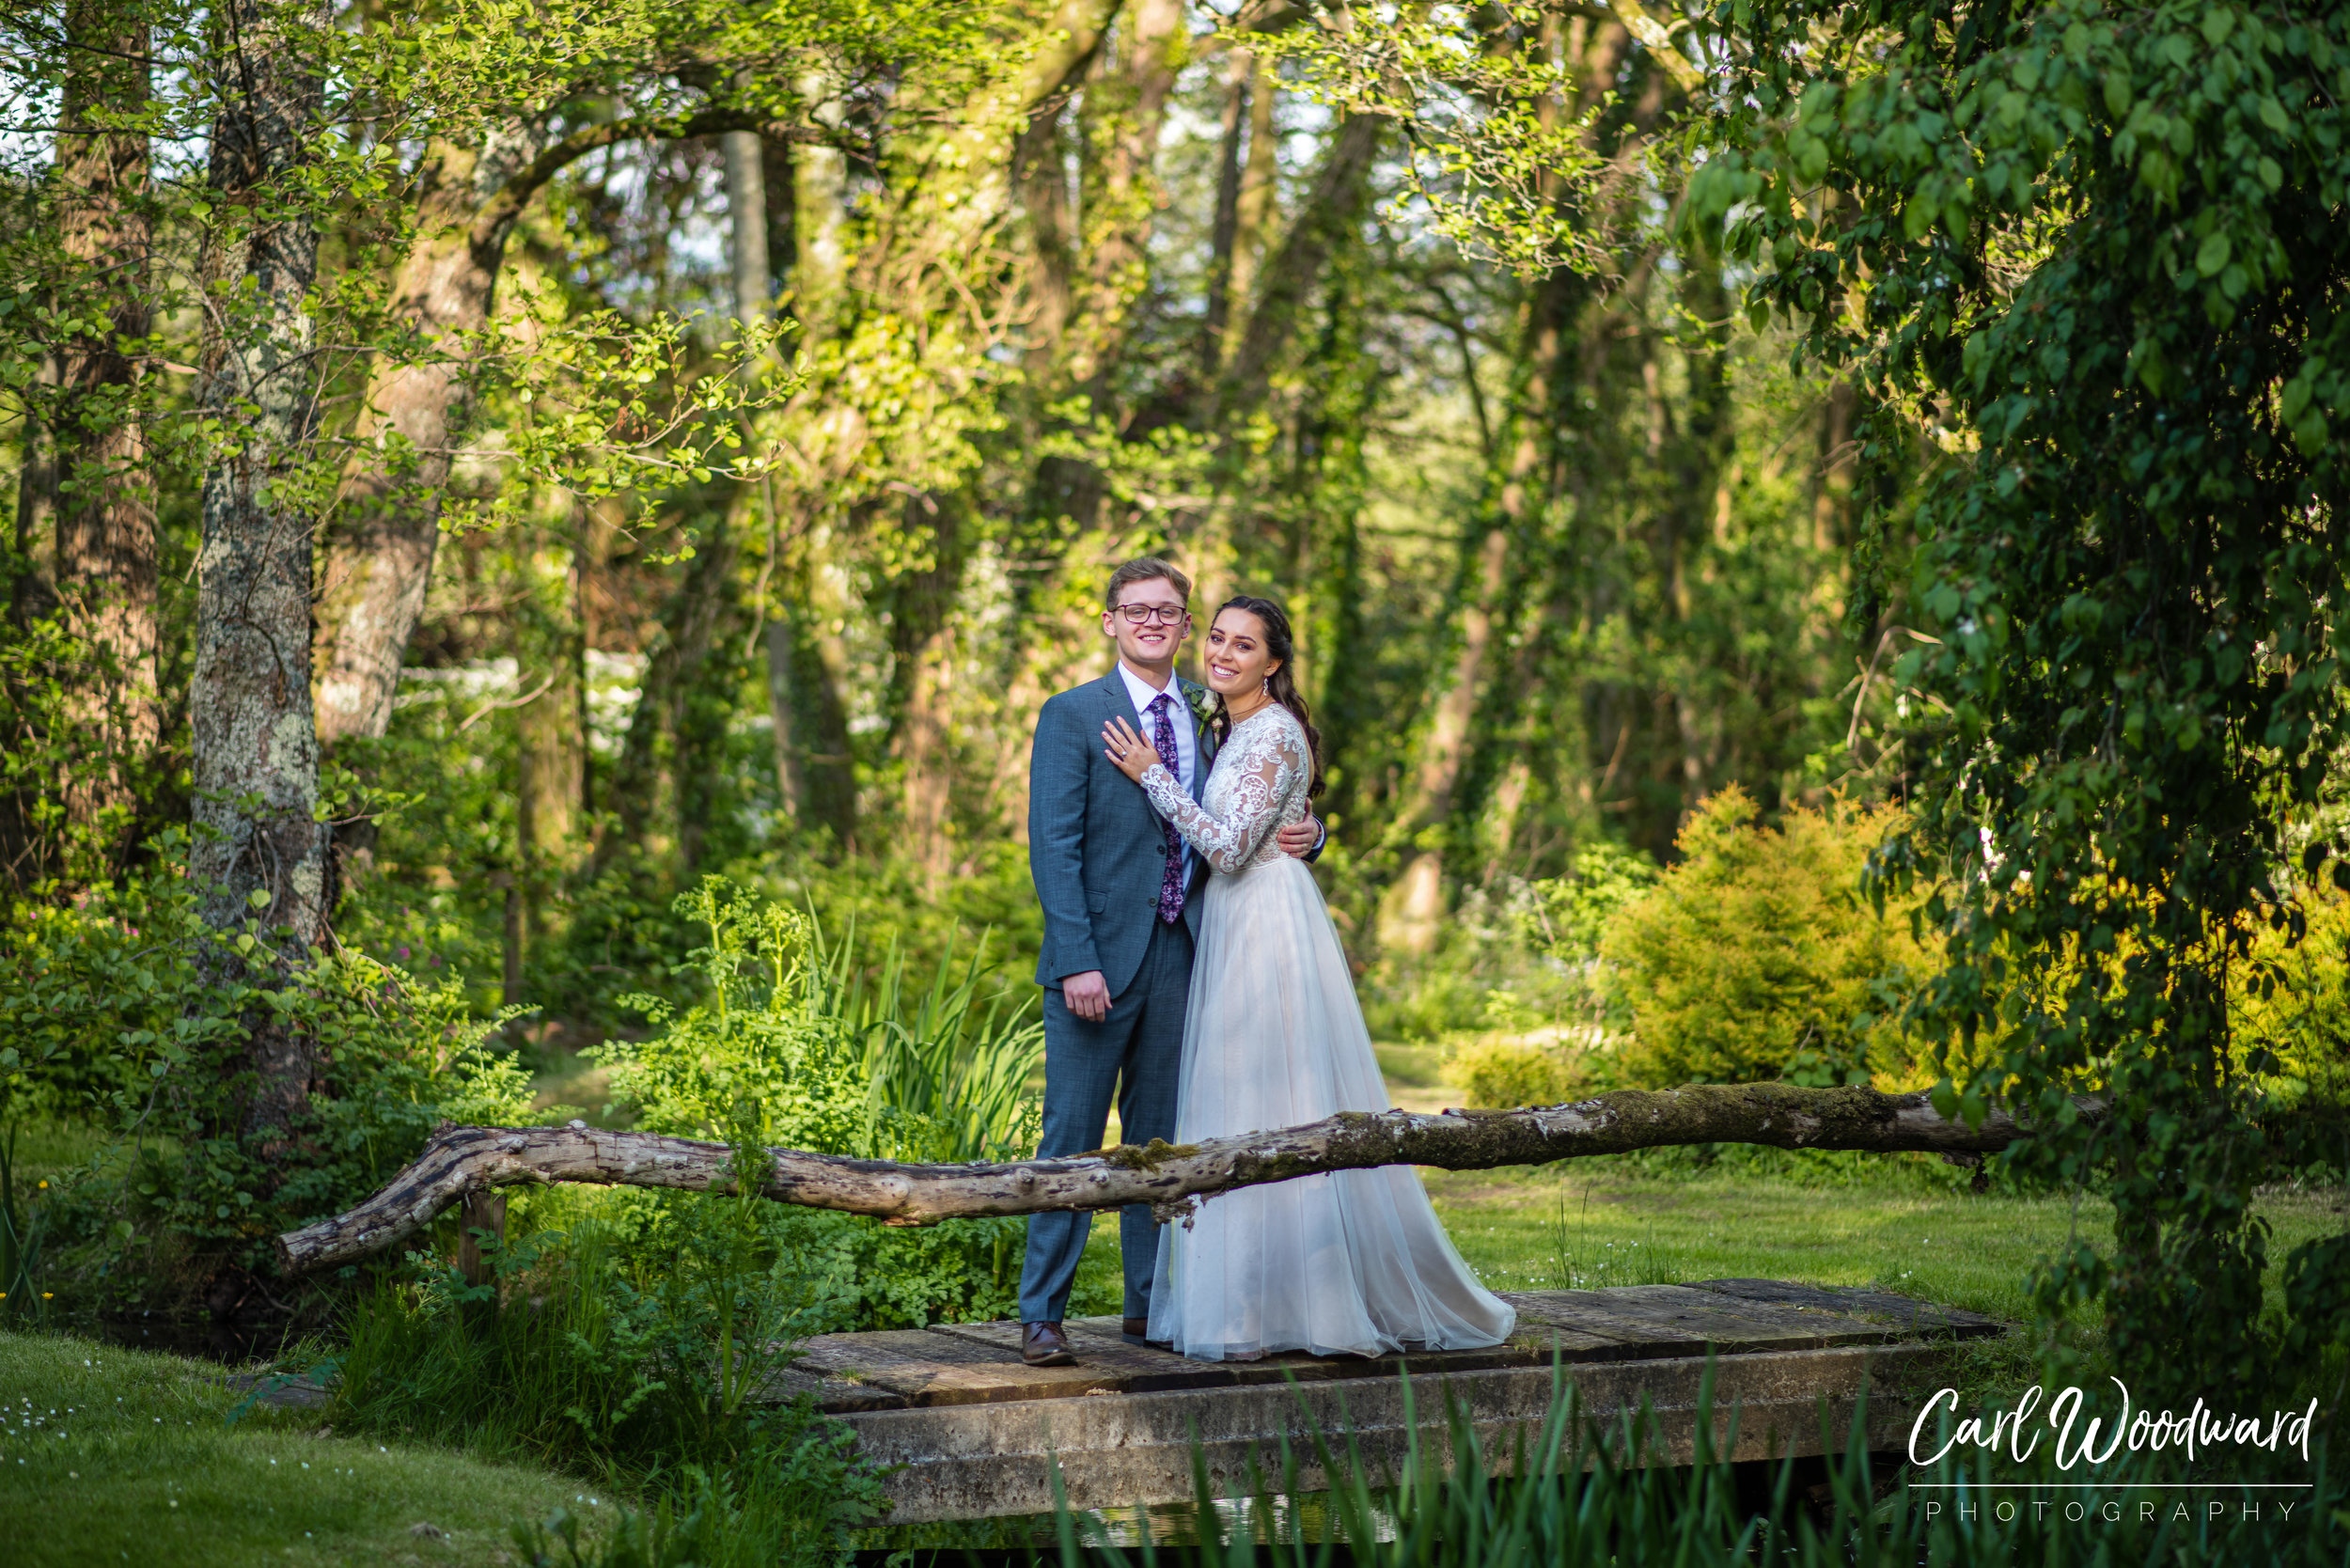 022-pencoed-house-estate-wedding-wedding-photography-cardiff-wedding-photographer.jpg